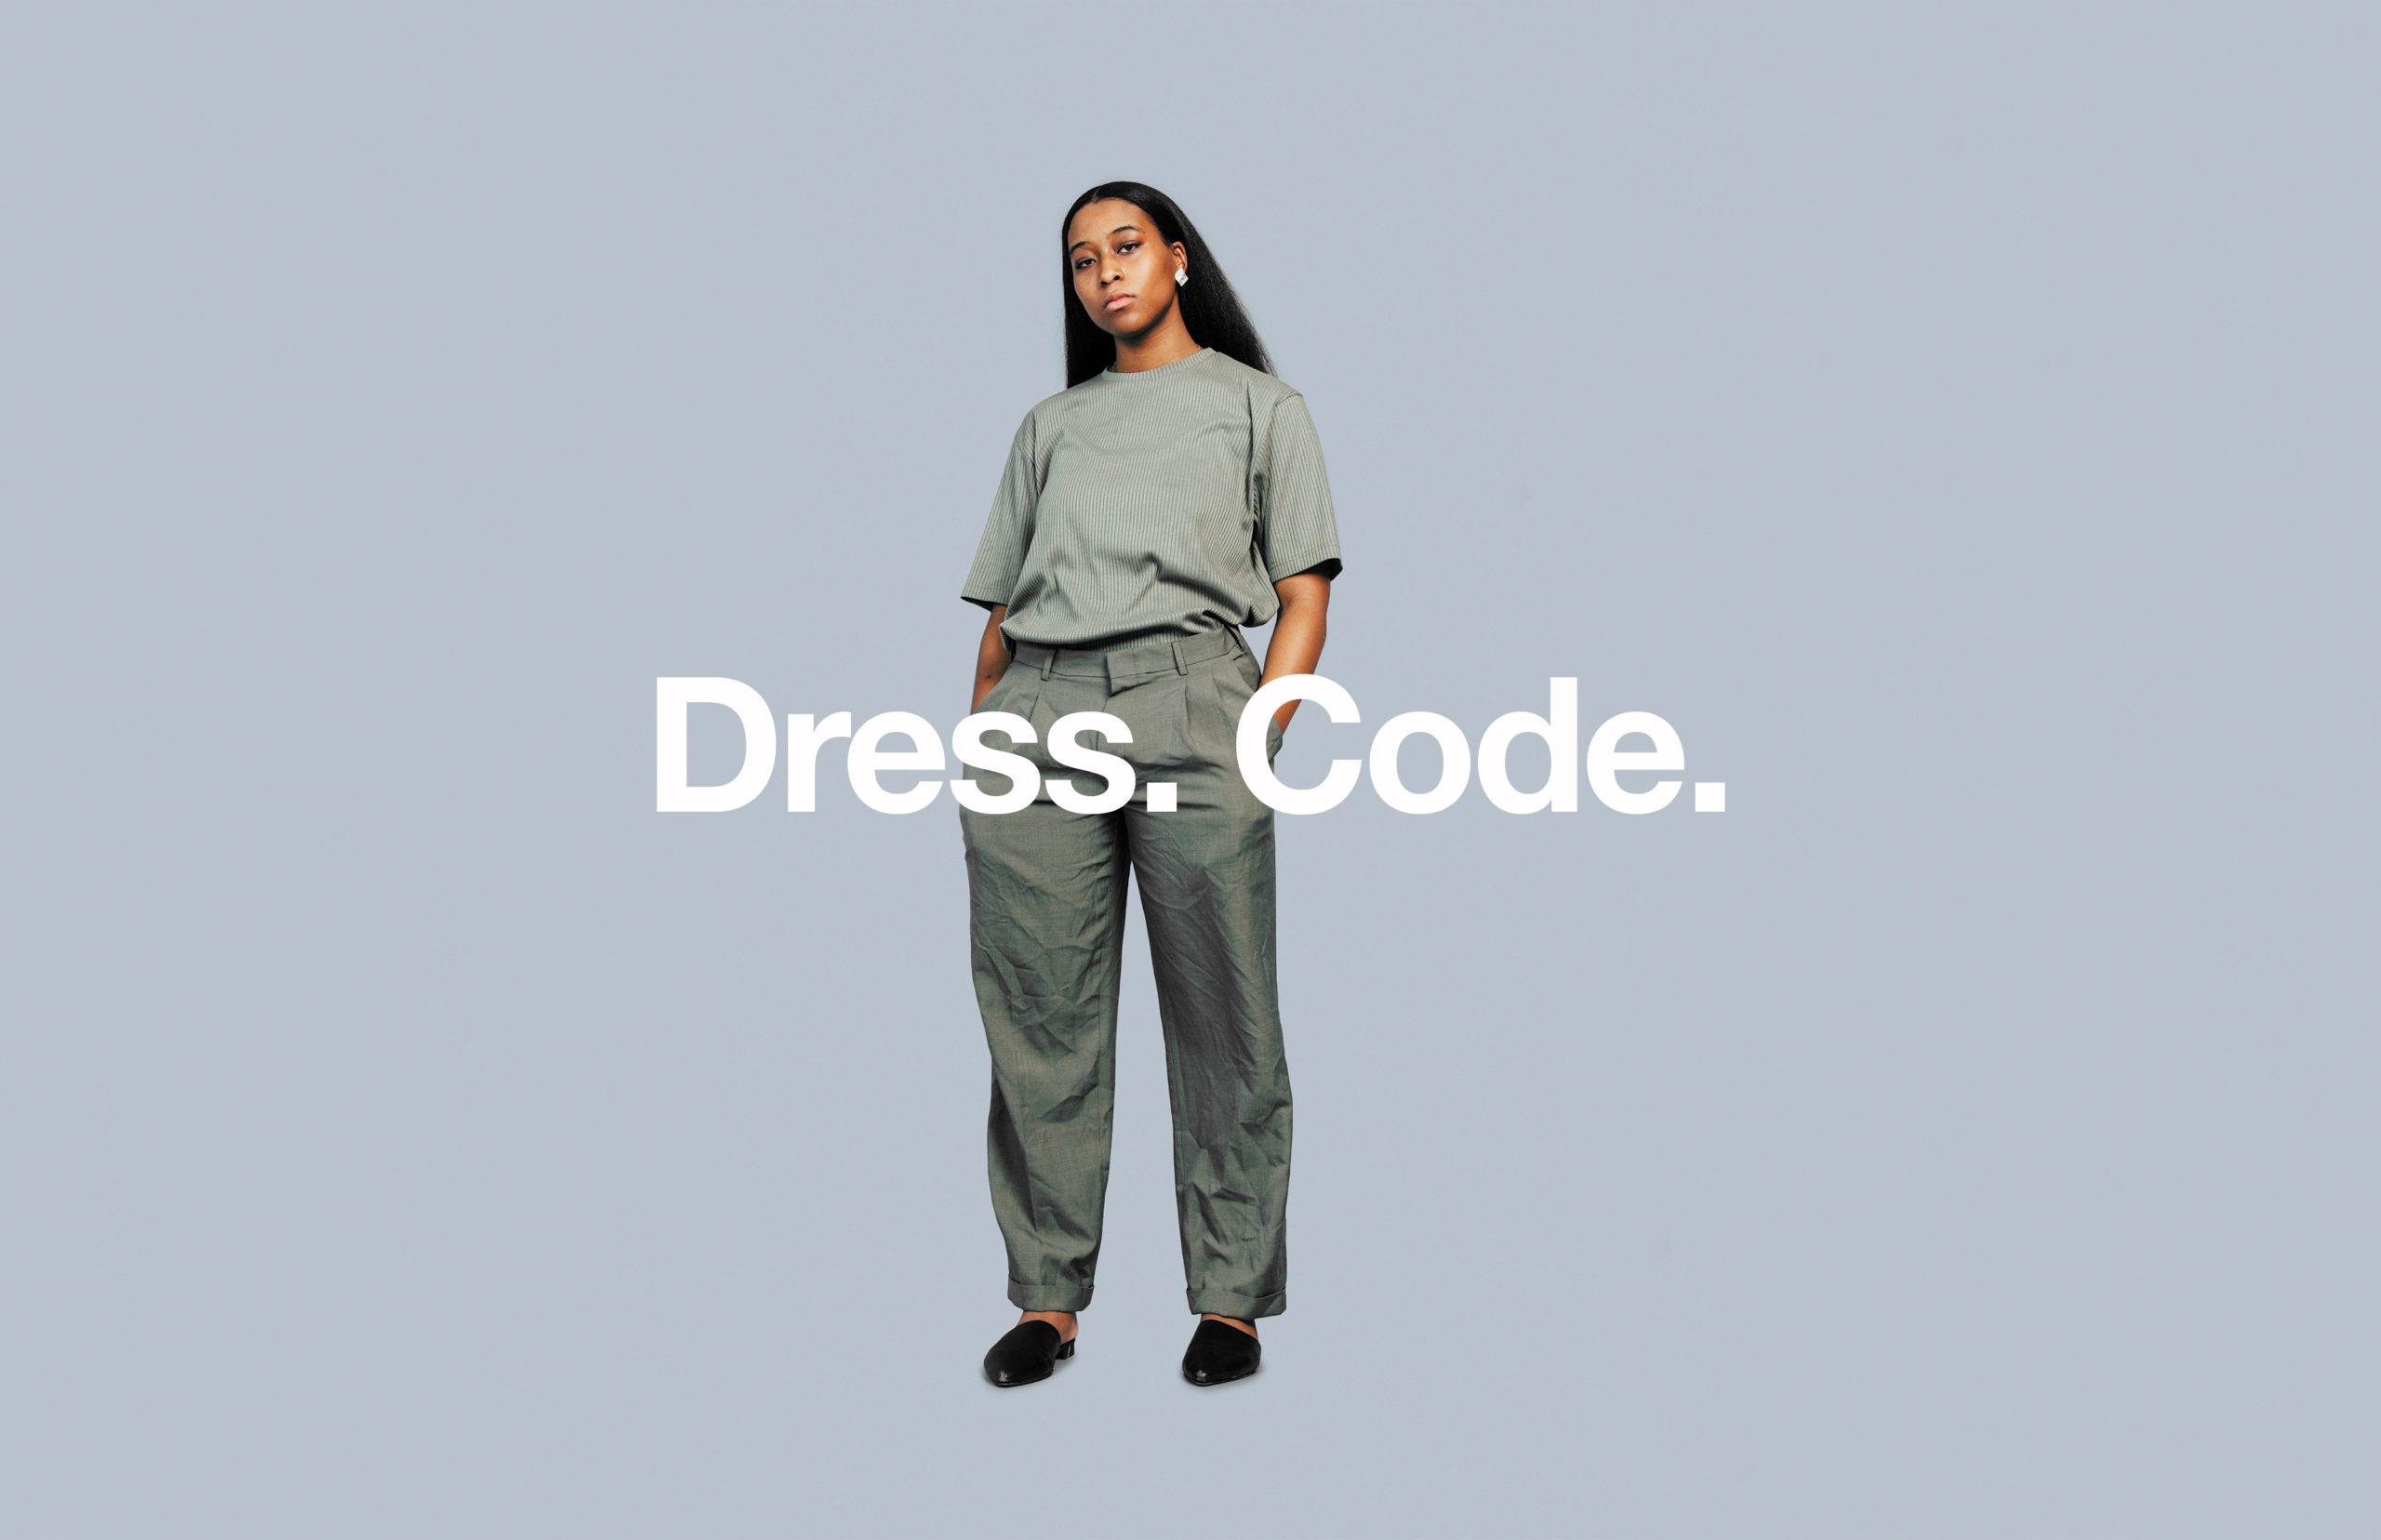 Dress. Code.